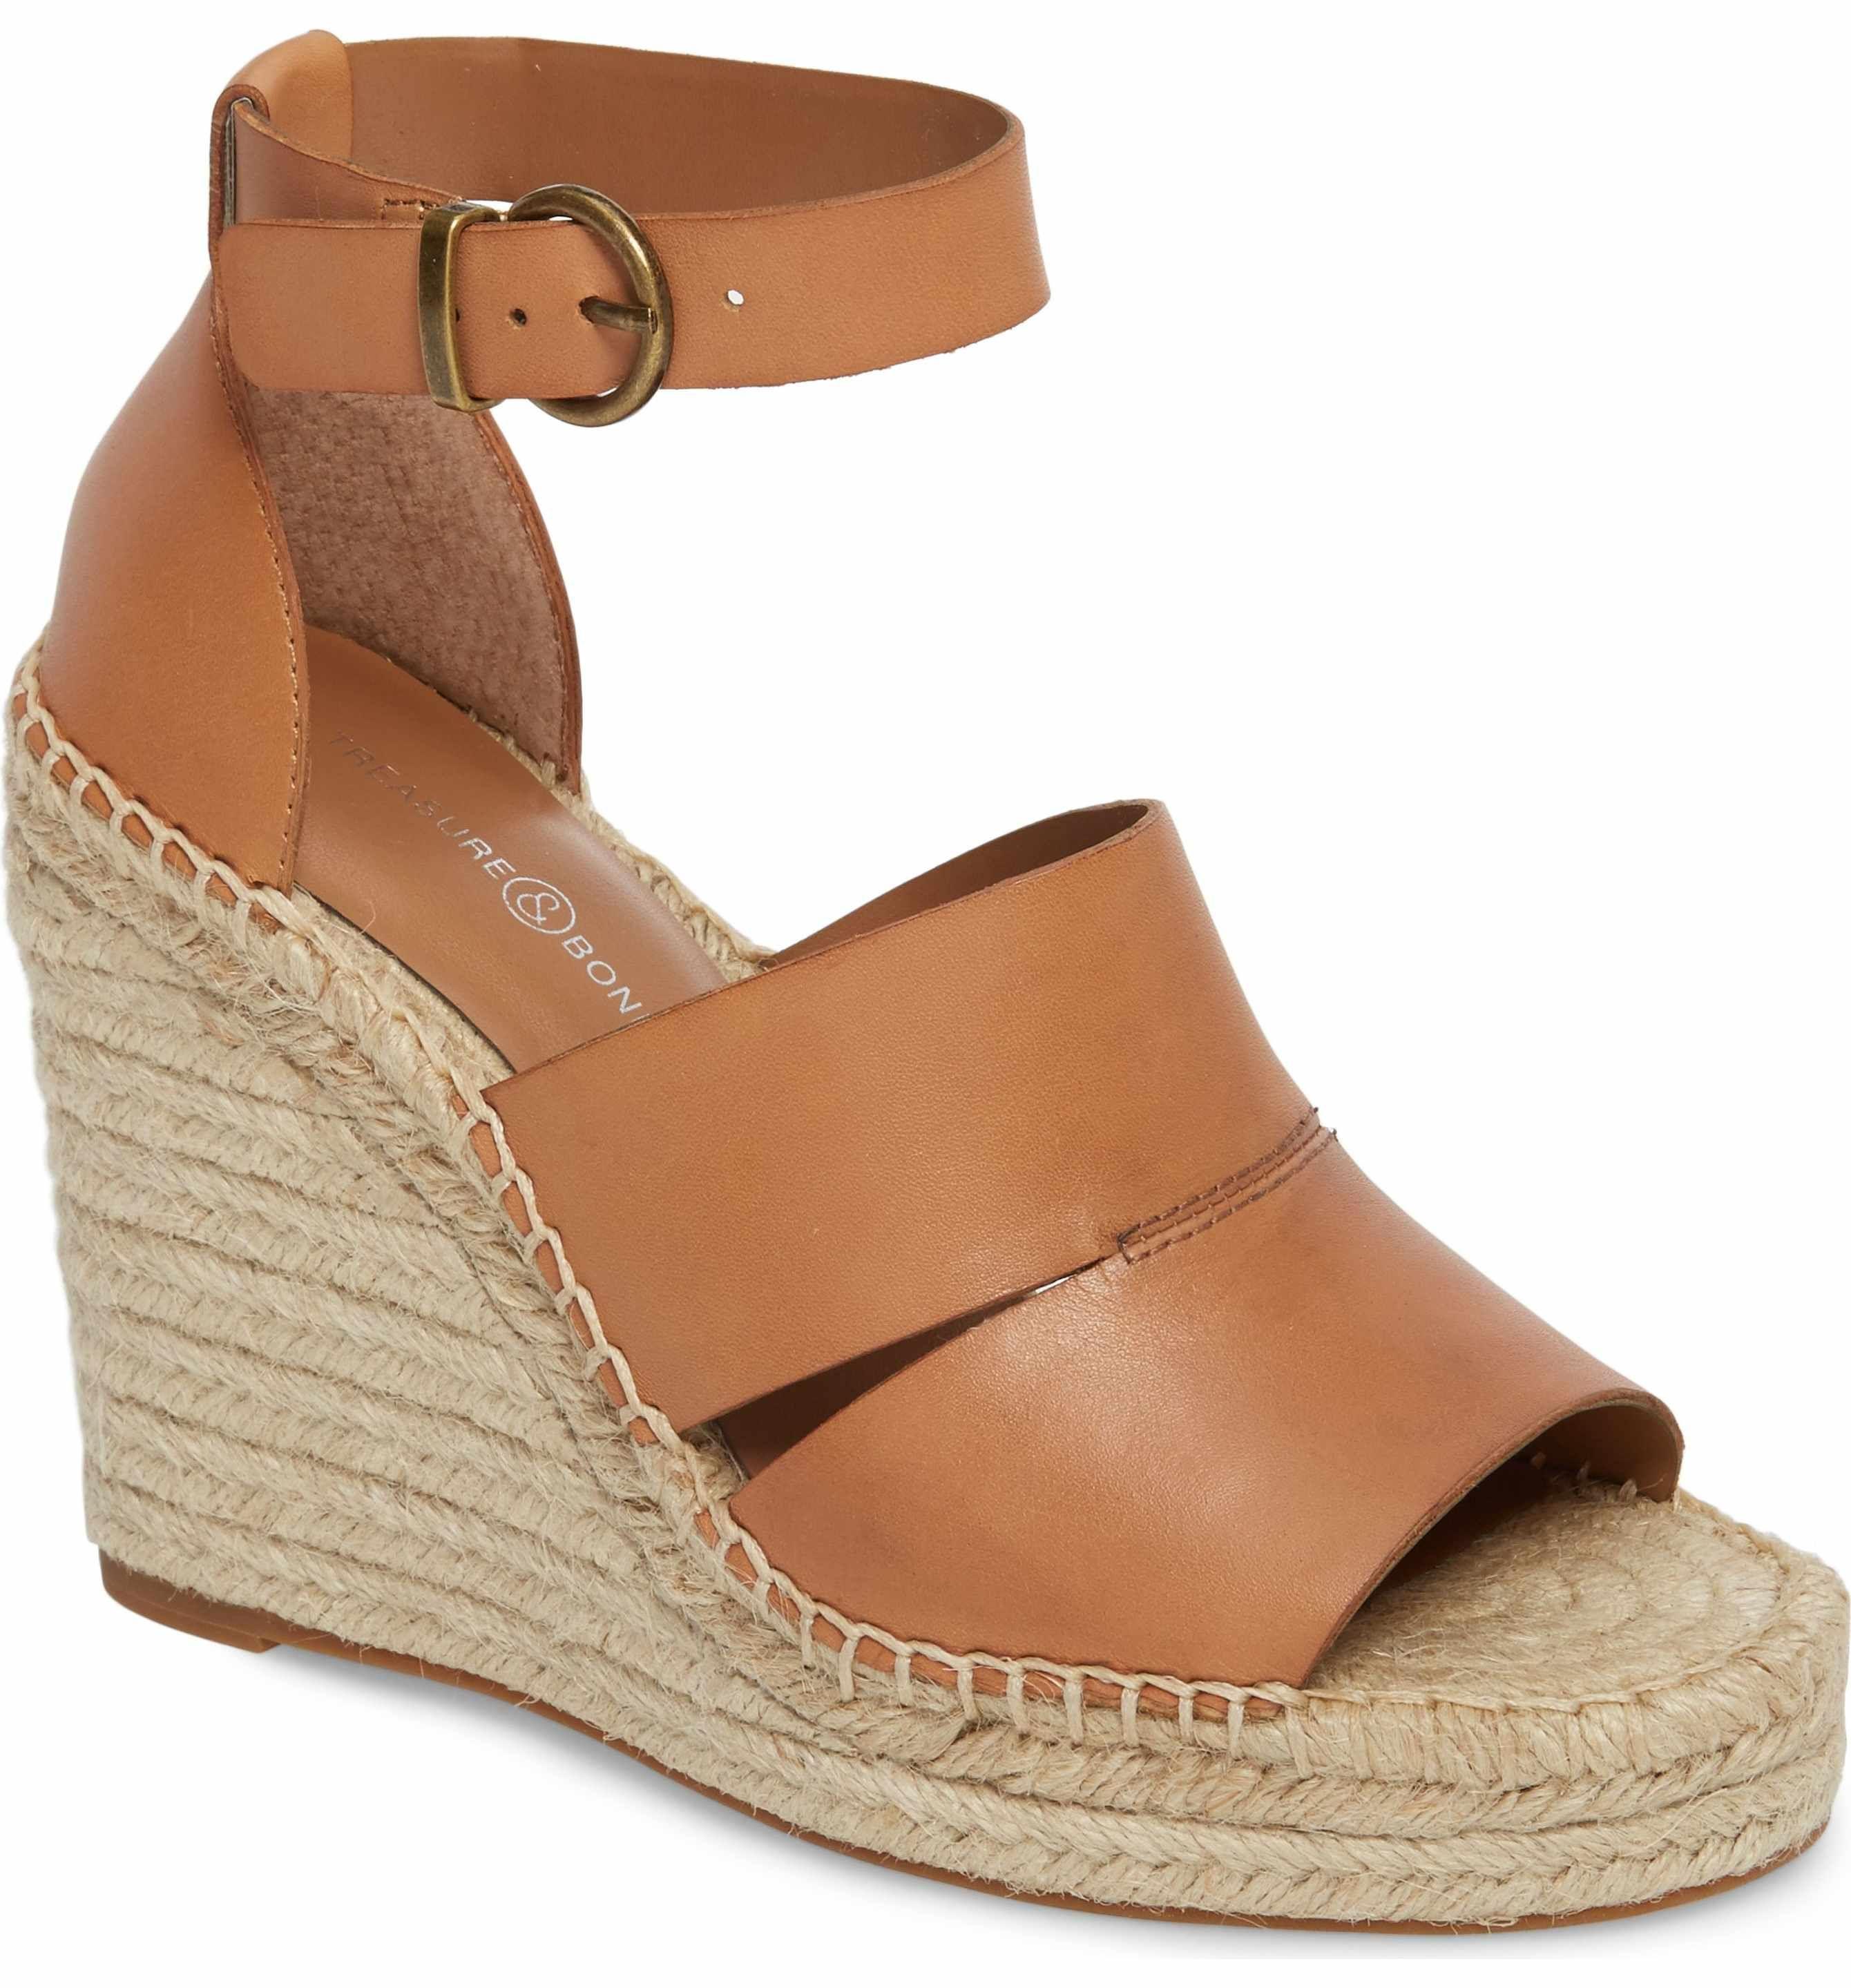 a29a7cdd915b Main Image - Treasure   Bond Sannibel Platform Wedge Sandal (Women ...